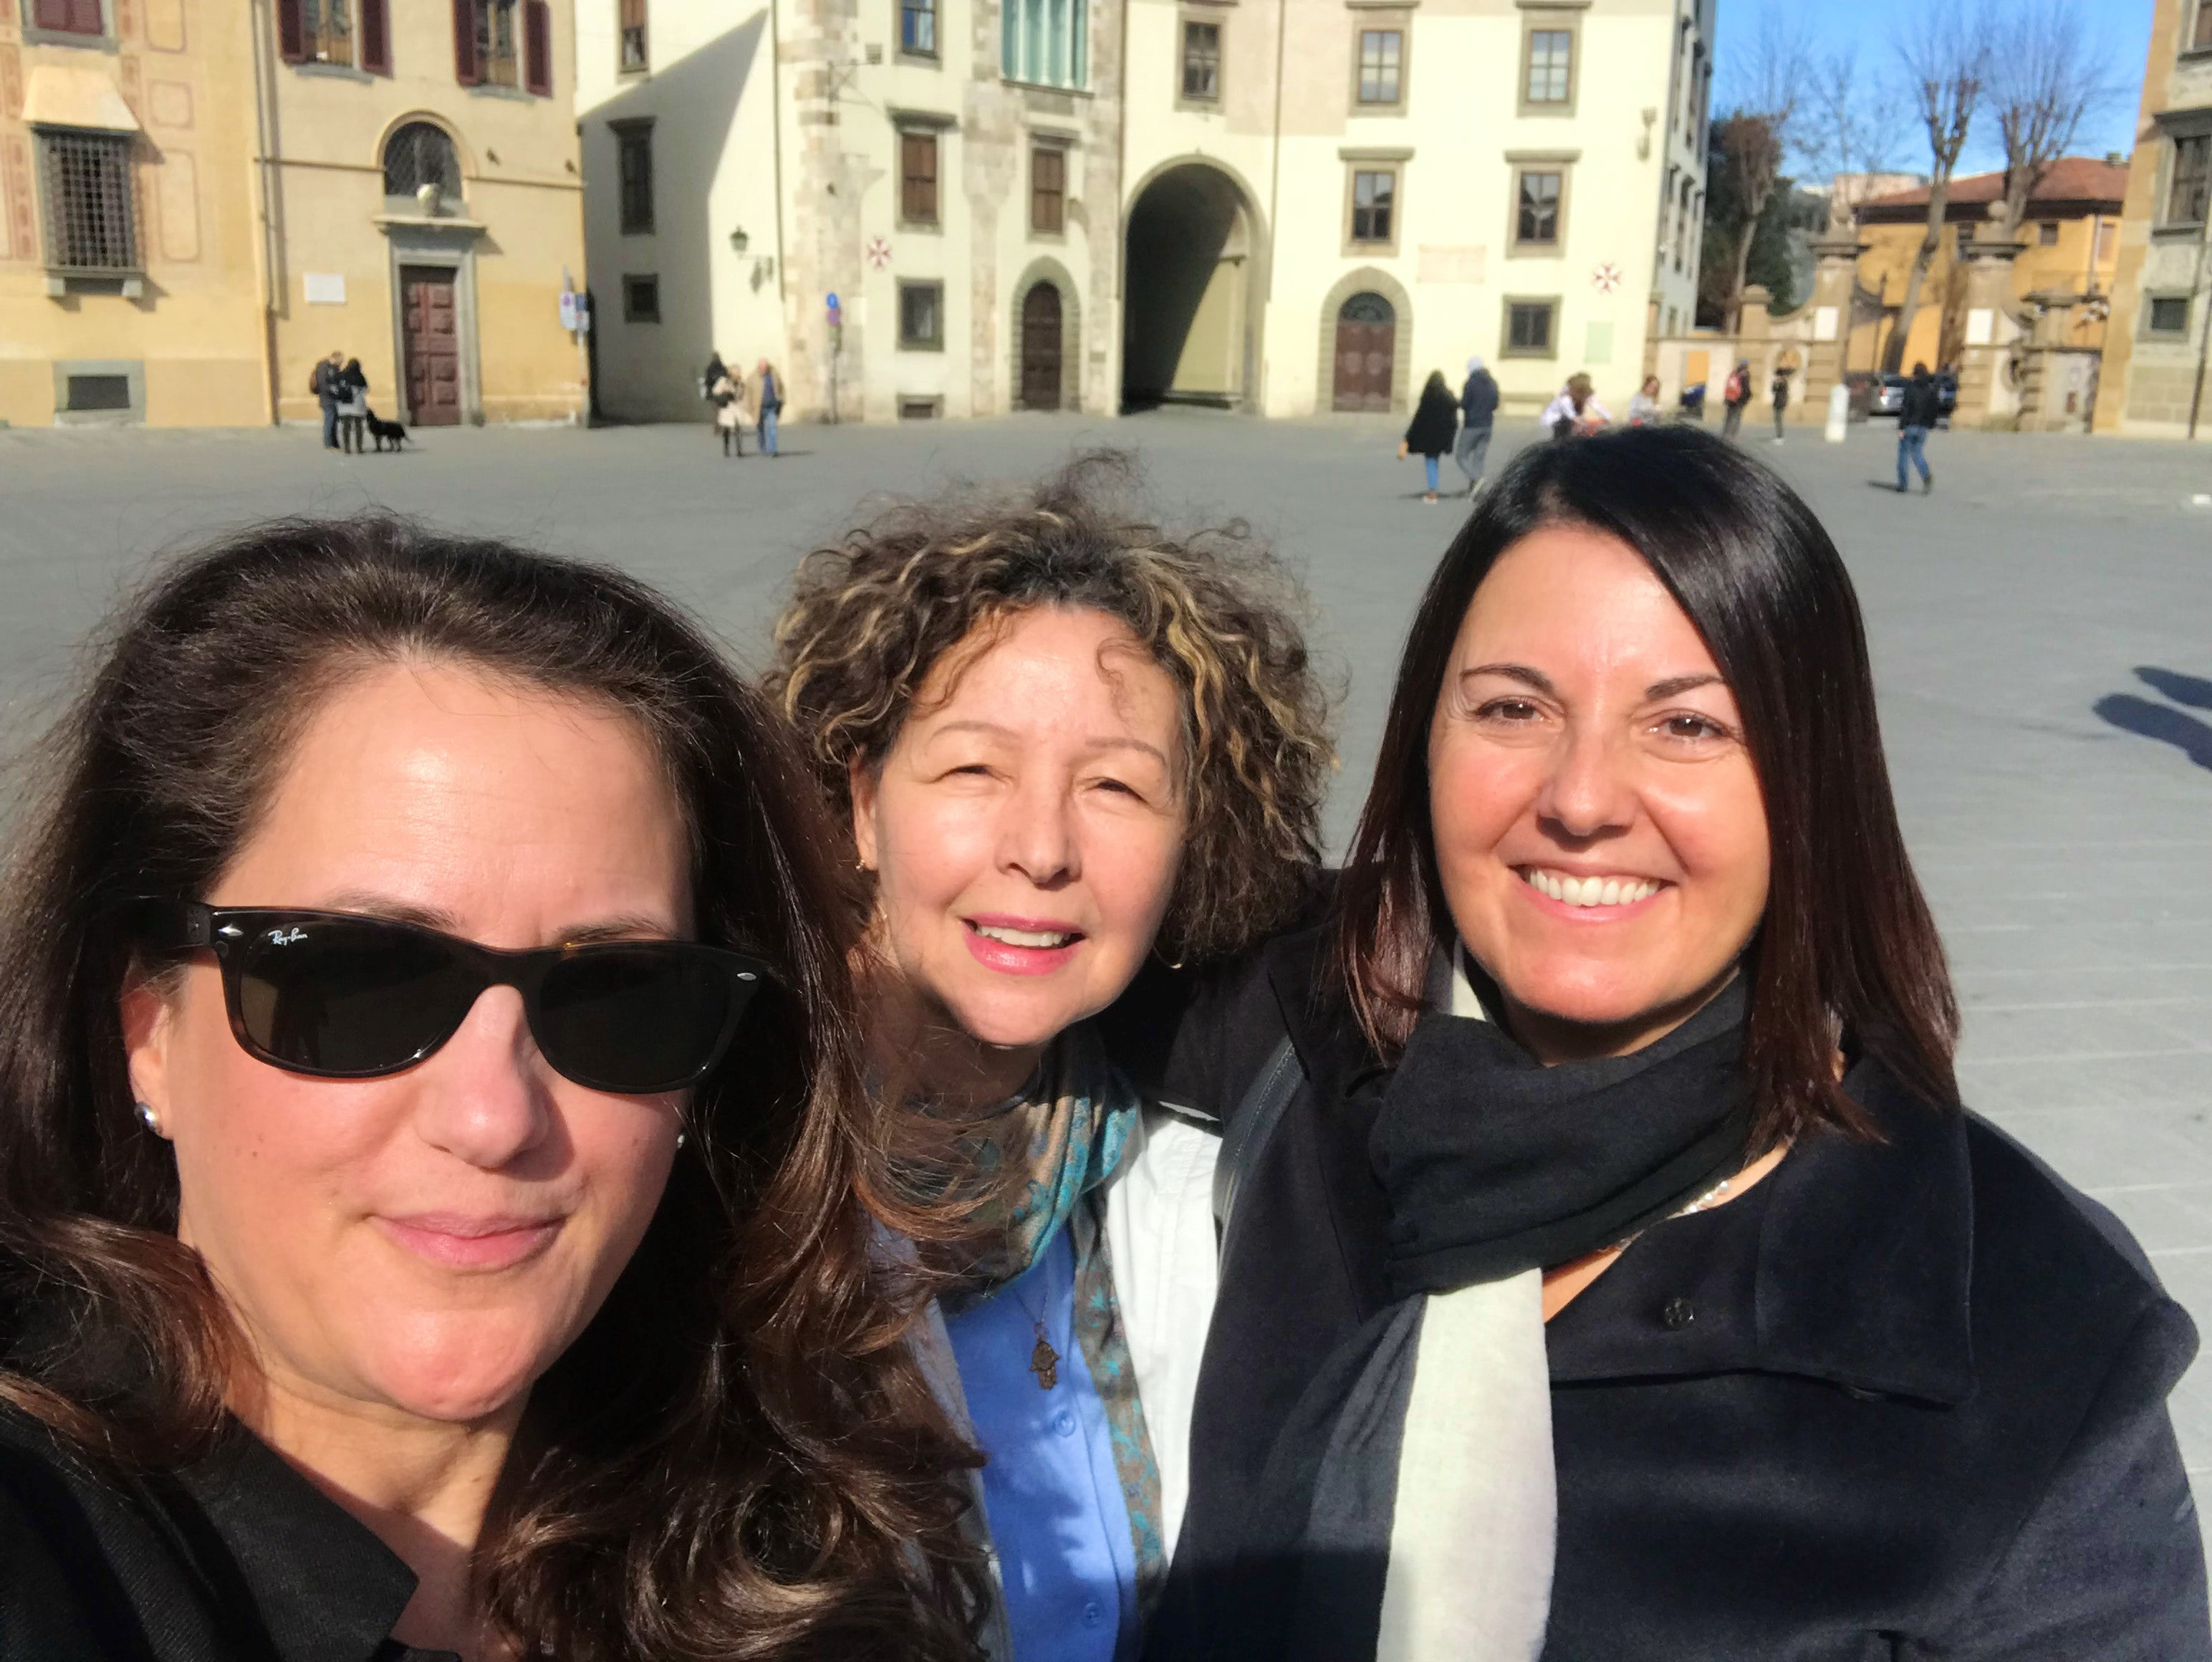 Italy Fam trip Tuscany and Rome (69 kms and 109,000 steps later) February 2019 (Lisa Bain and Manya Kellou)